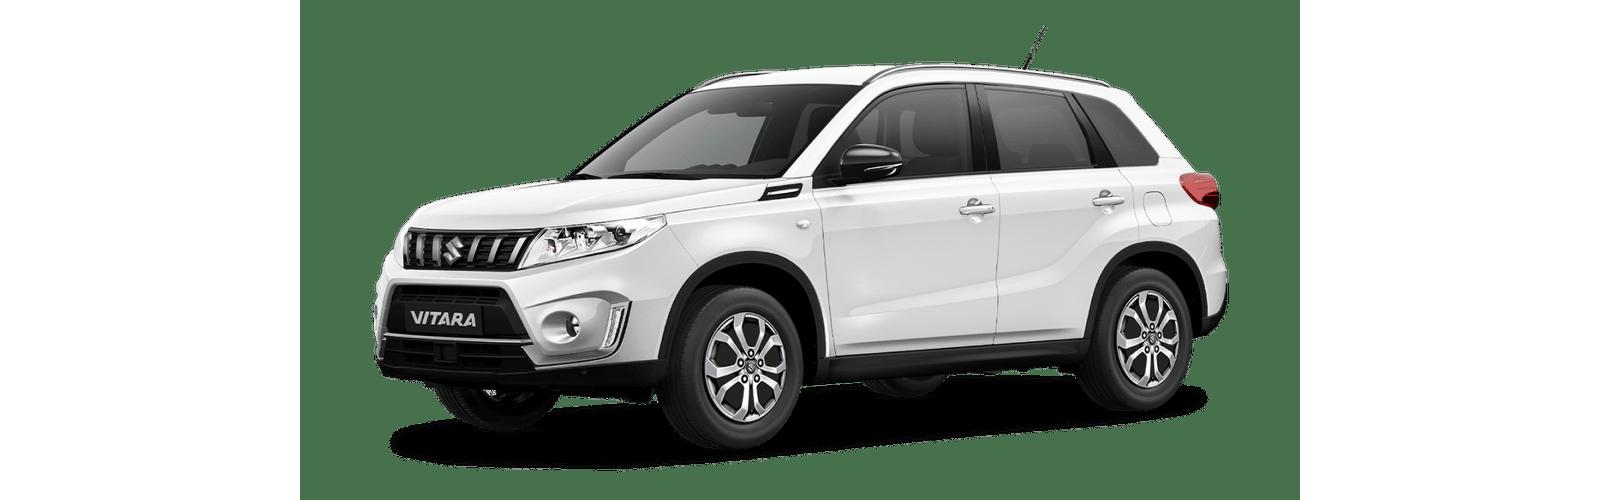 Suzuki-VITARA-GL-Blanco.png